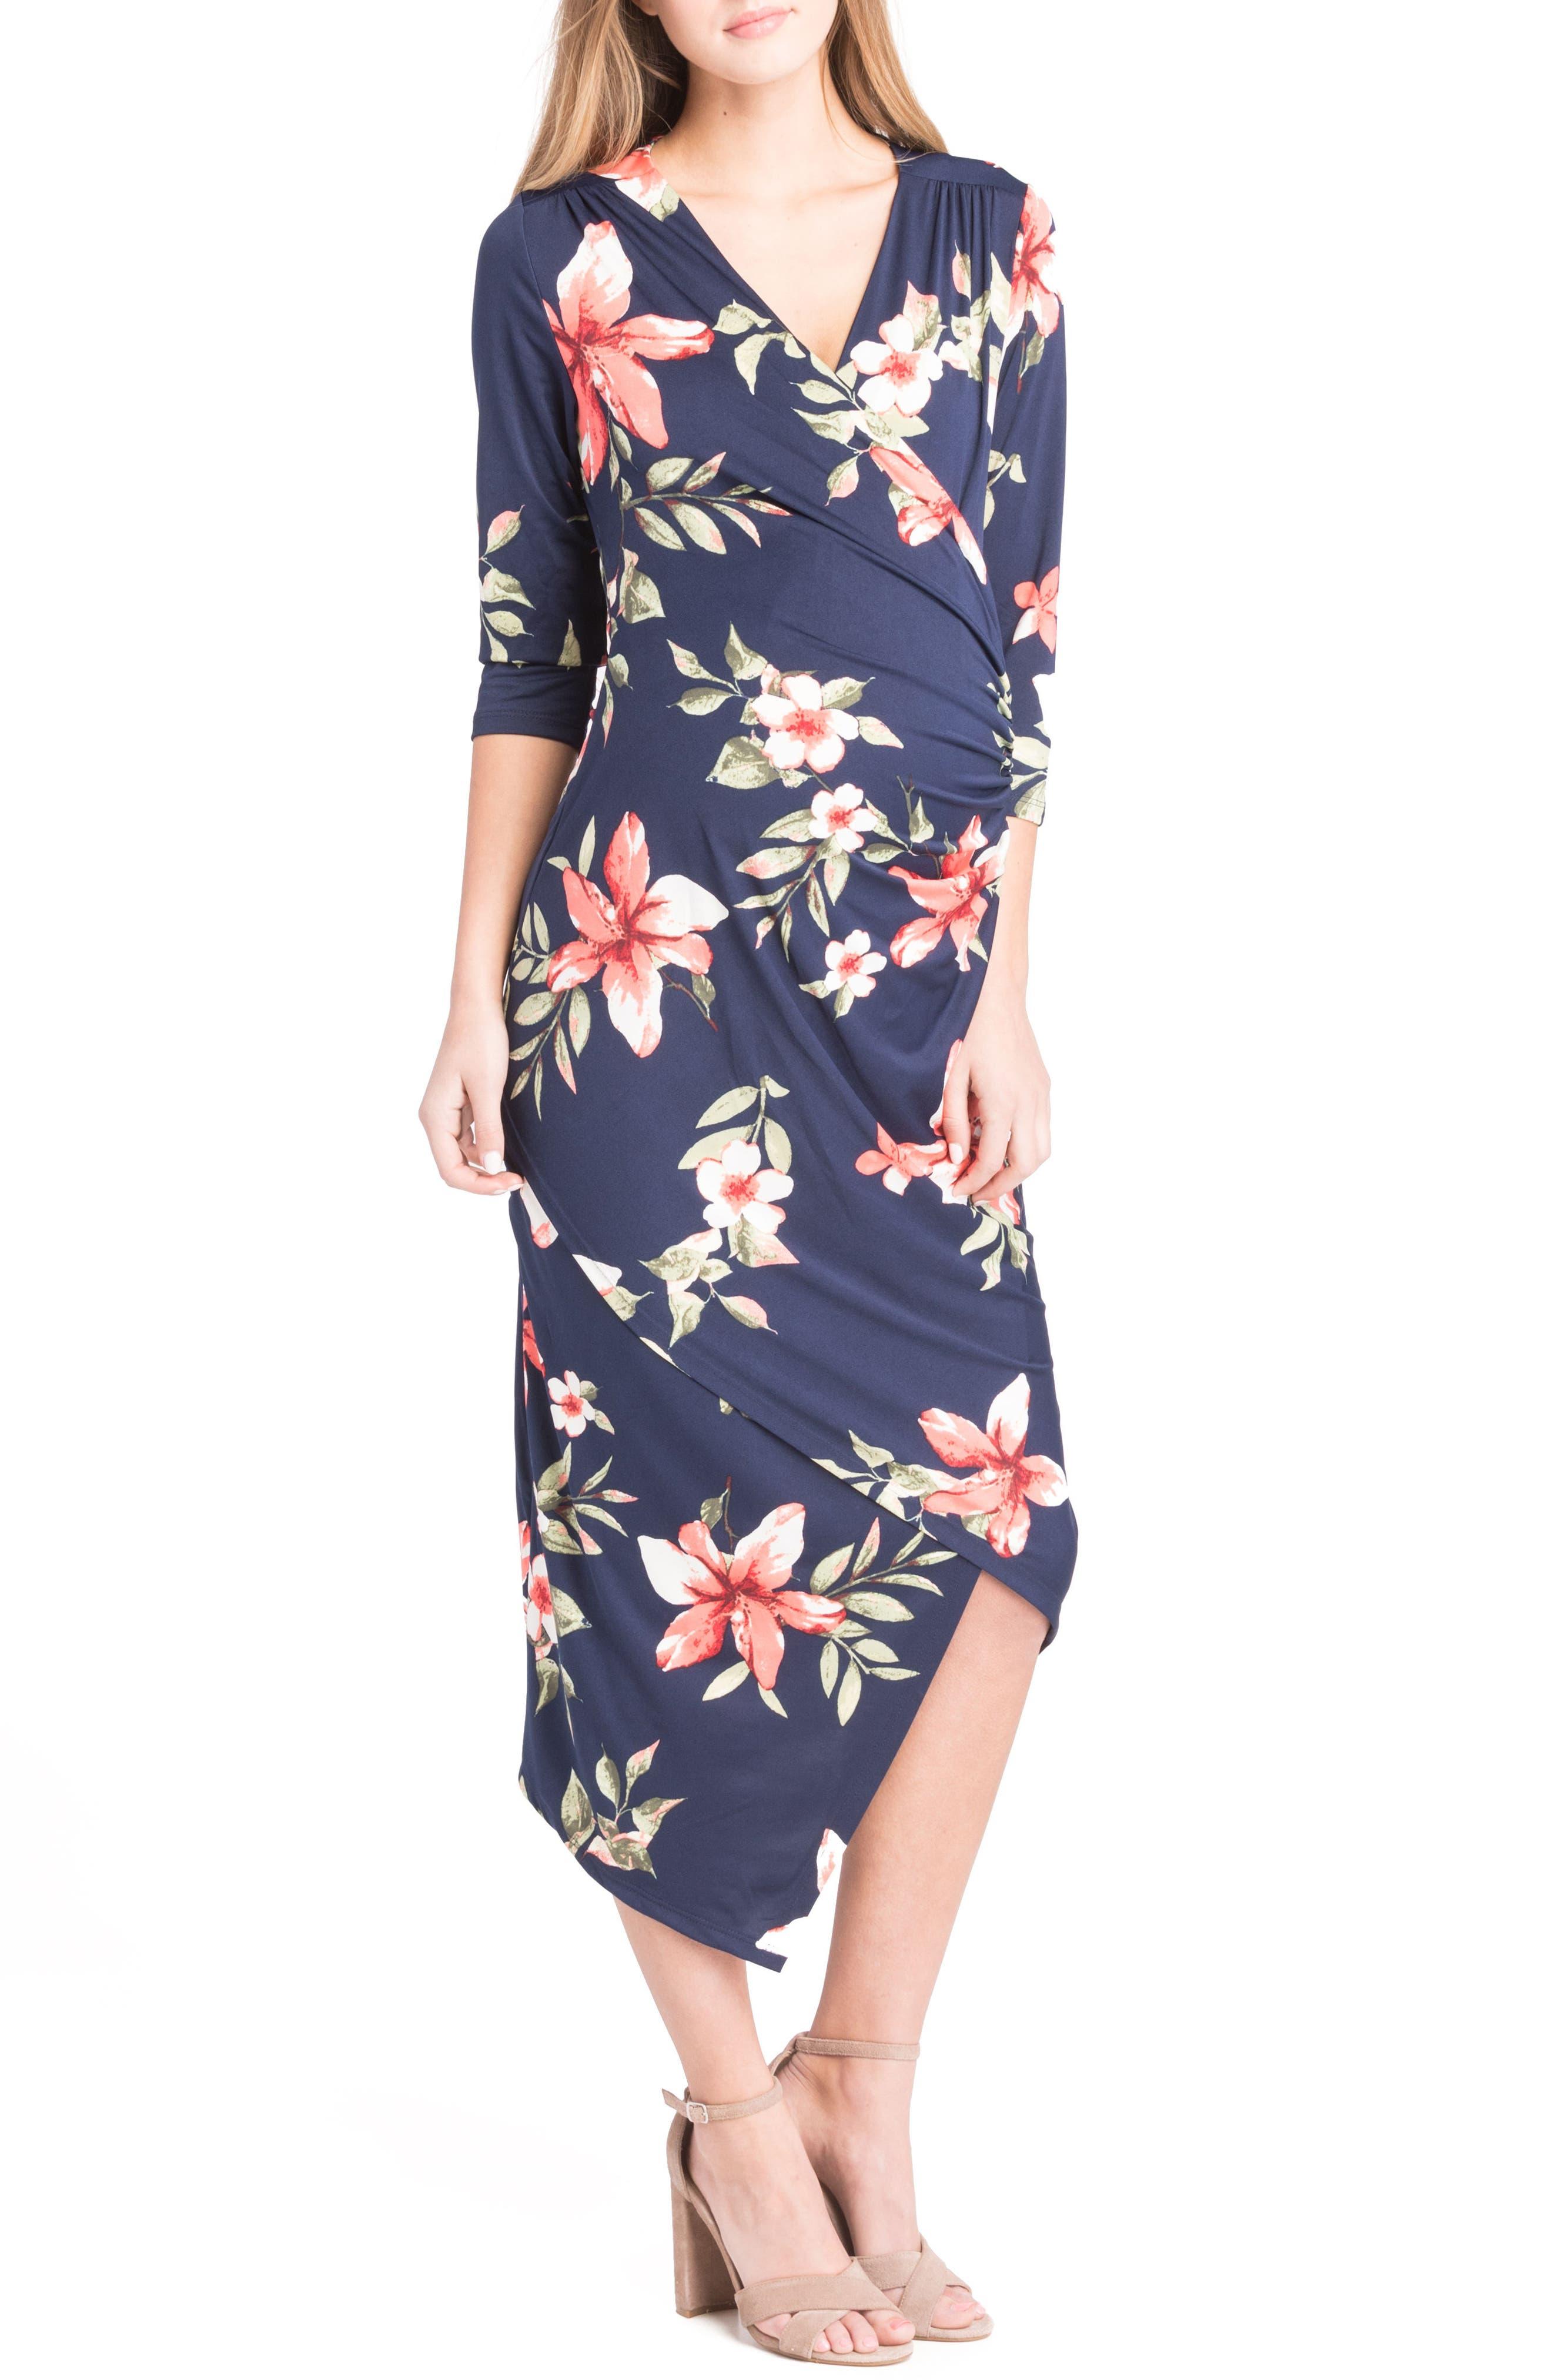 Alternate Image 1 Selected - Lilac Clothing Asymmetrical Surplice Maternity/Nursing Dress